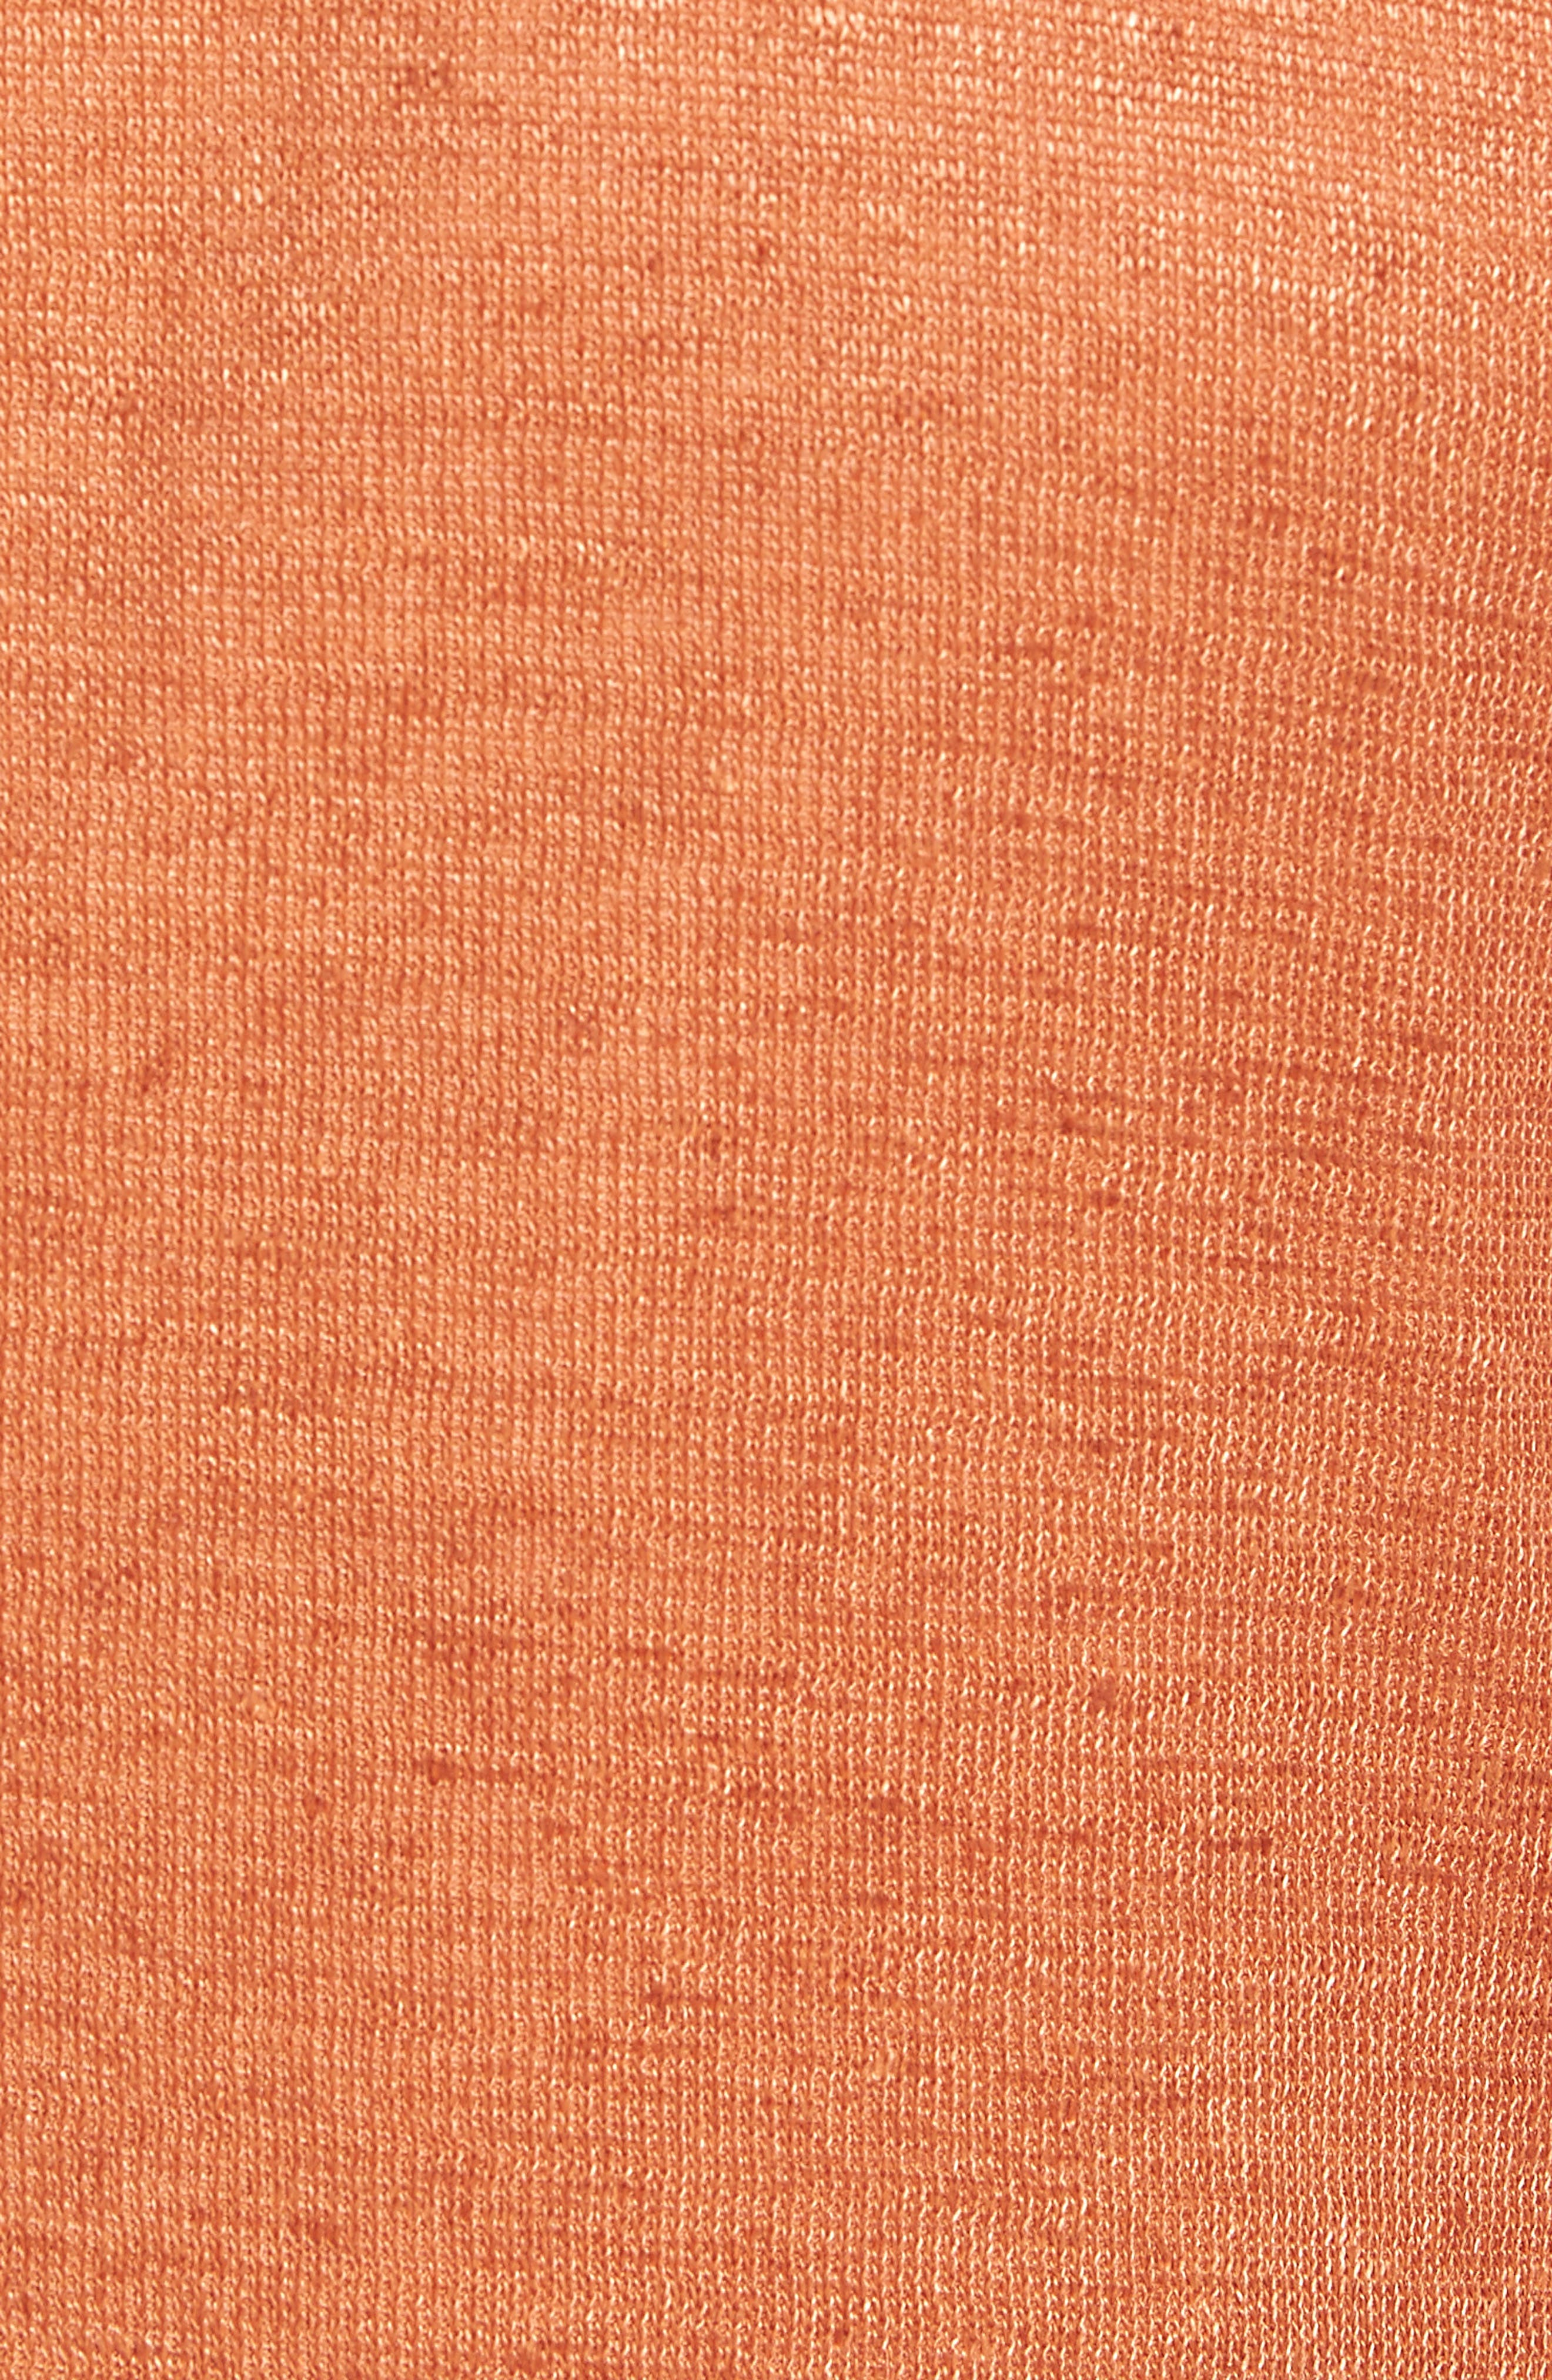 Trim Fit Heathered Jersey Blazer,                             Alternate thumbnail 6, color,                             800